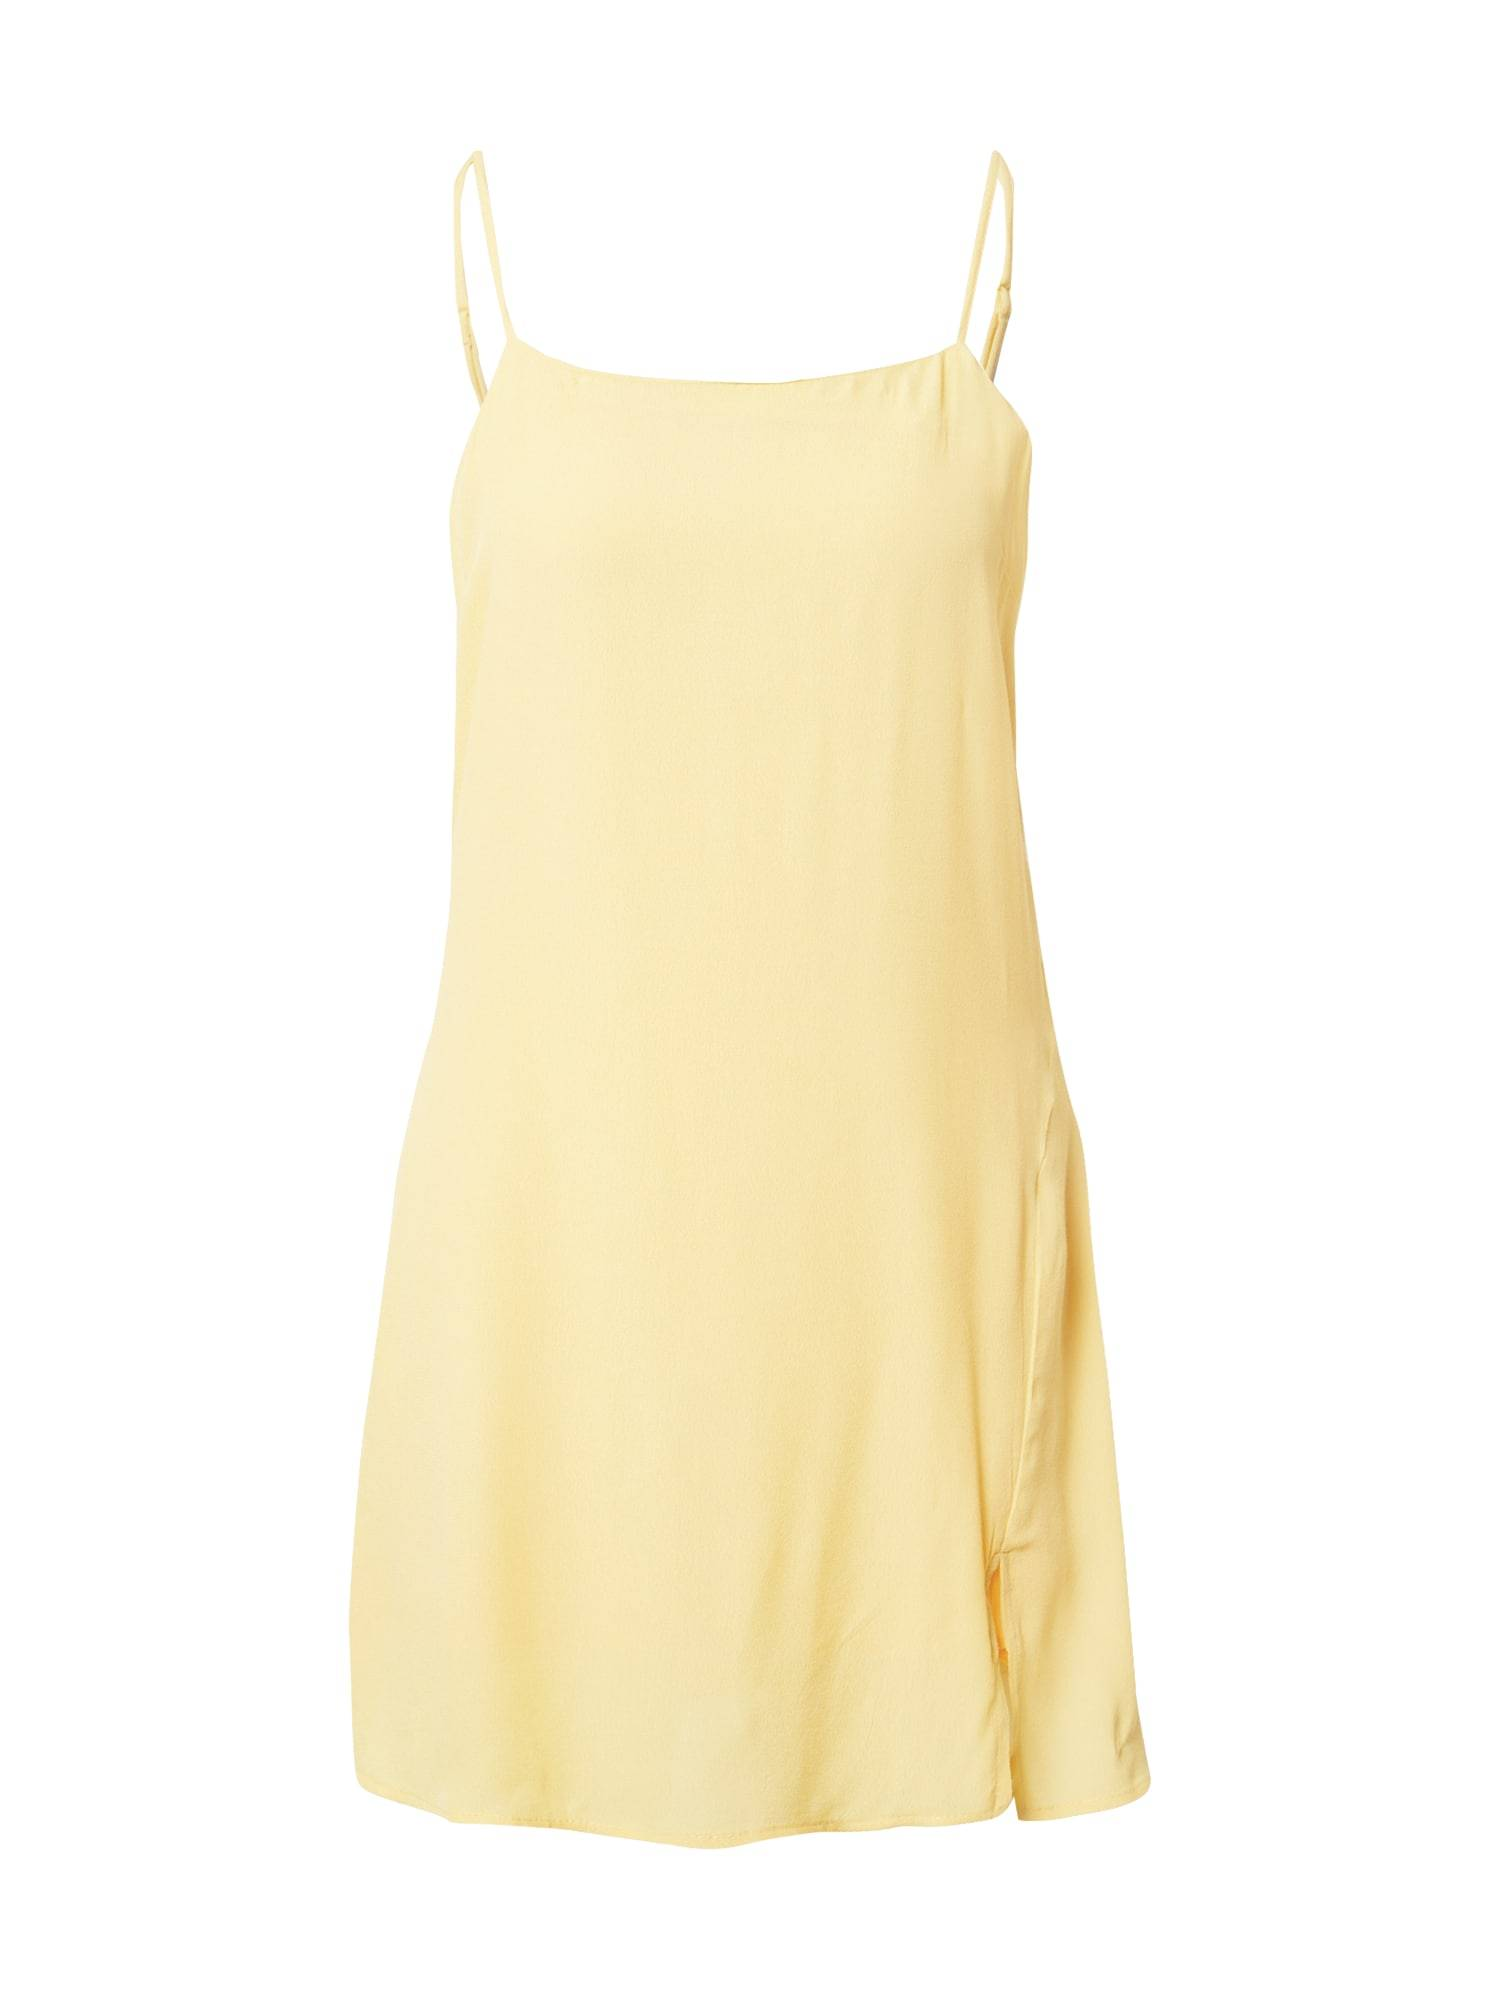 Cotton On Robe 'Kye'  - Jaune - Taille: 14 - female